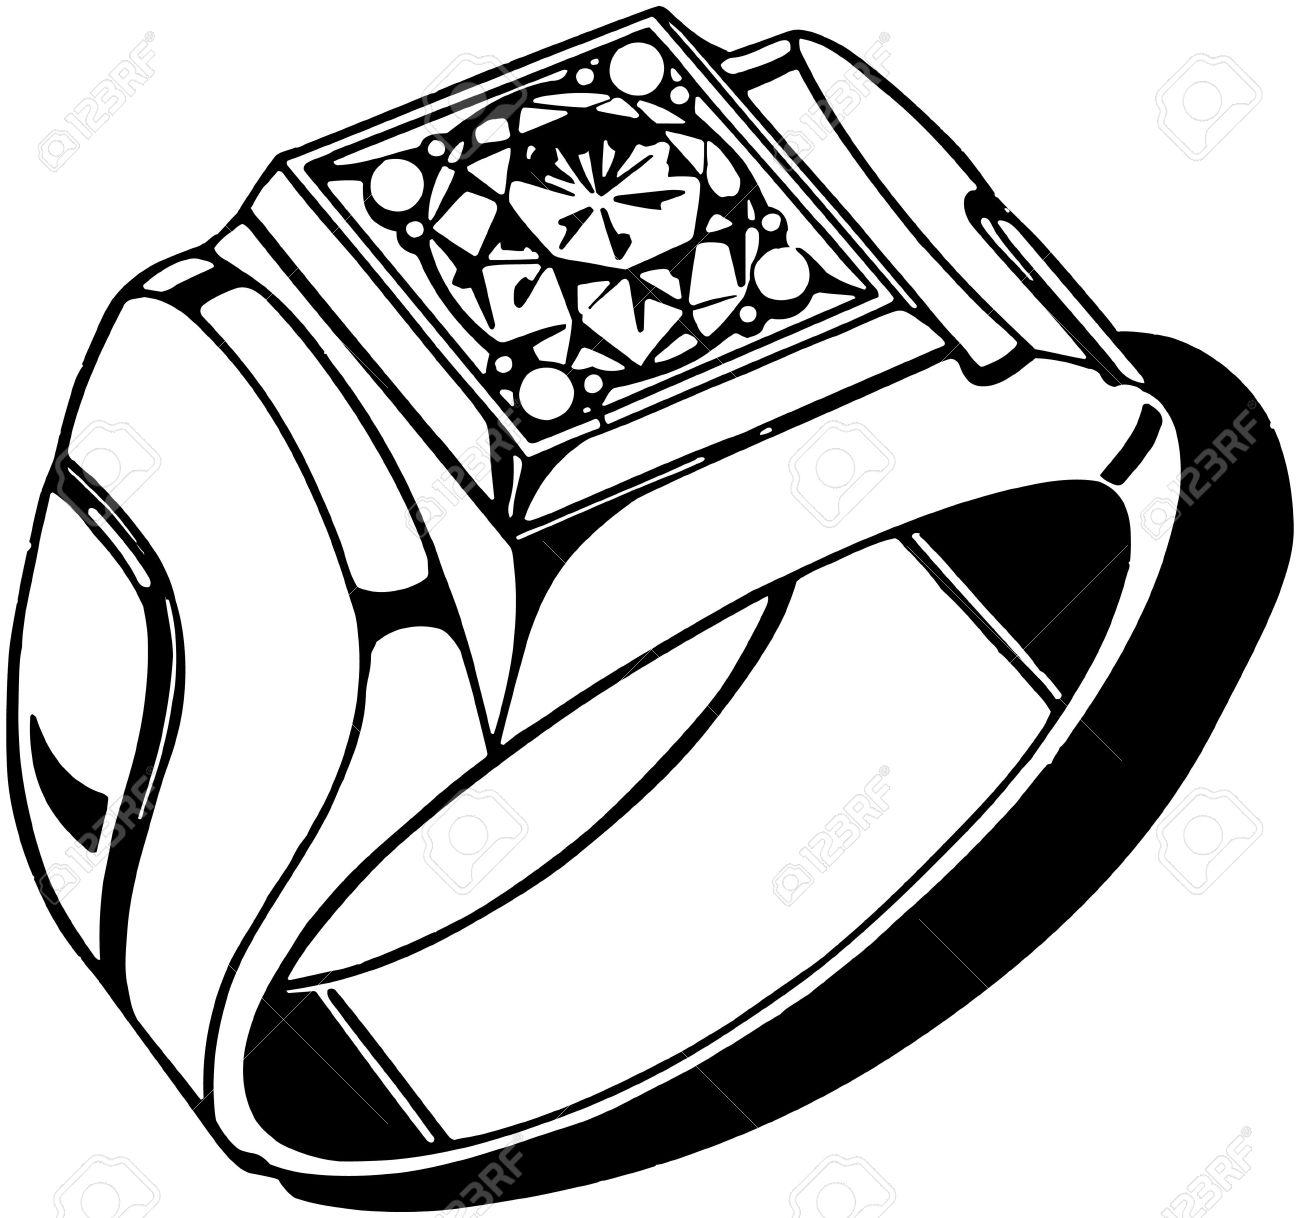 mens diamond ring royalty free cliparts vectors and stock rh 123rf com Men's Class Rings Men's Class Rings